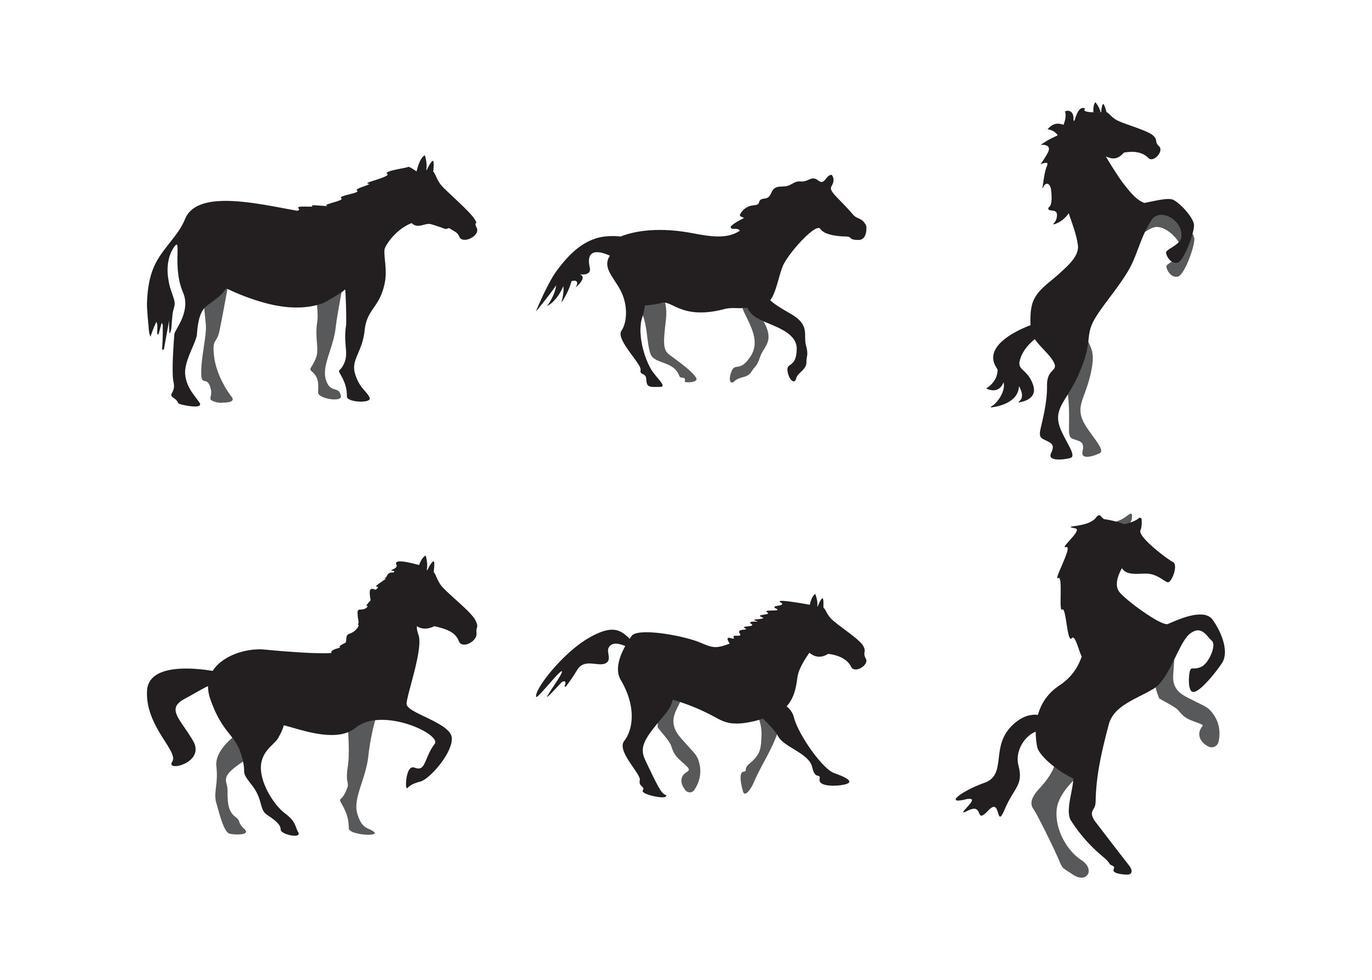 Pferdesilhouette eingestellt vektor